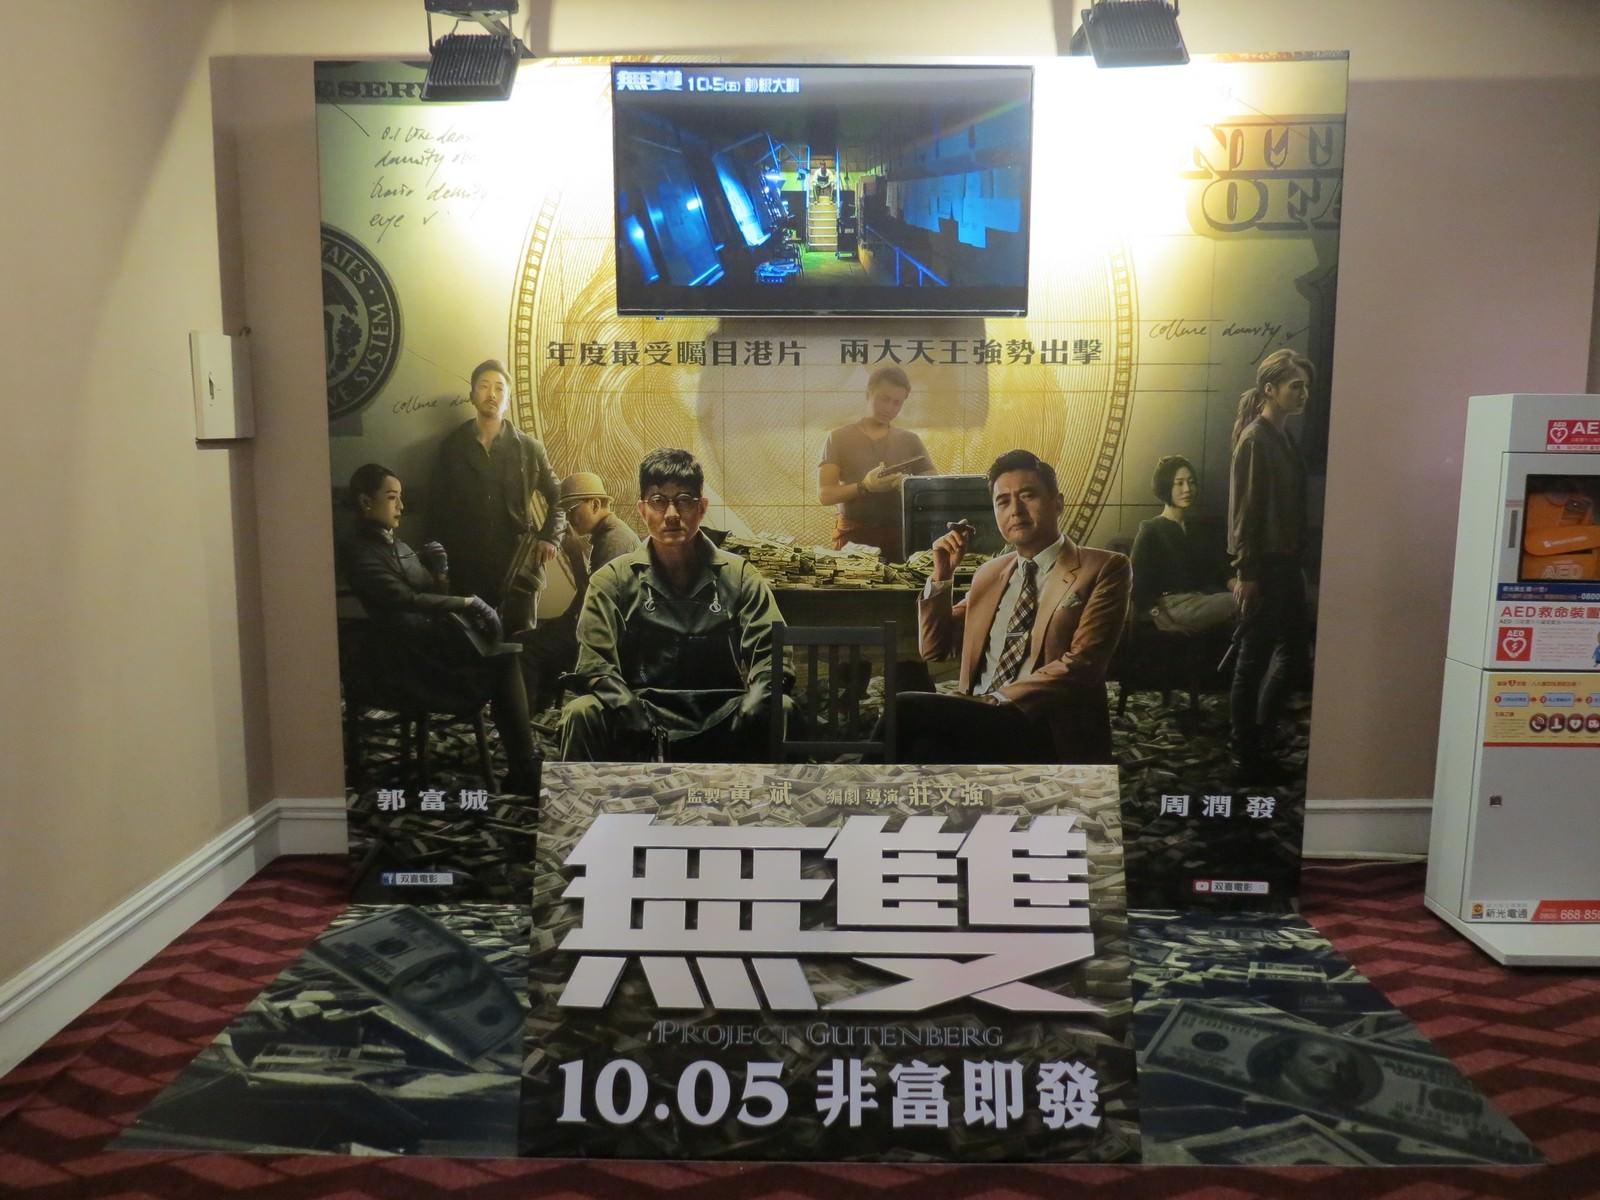 Movie, 無雙(中國.香港, 2018) / 無雙(台灣) / 无双(中國) / Project Gutenberg(英文), 廣告看板, 欣欣秀泰影城